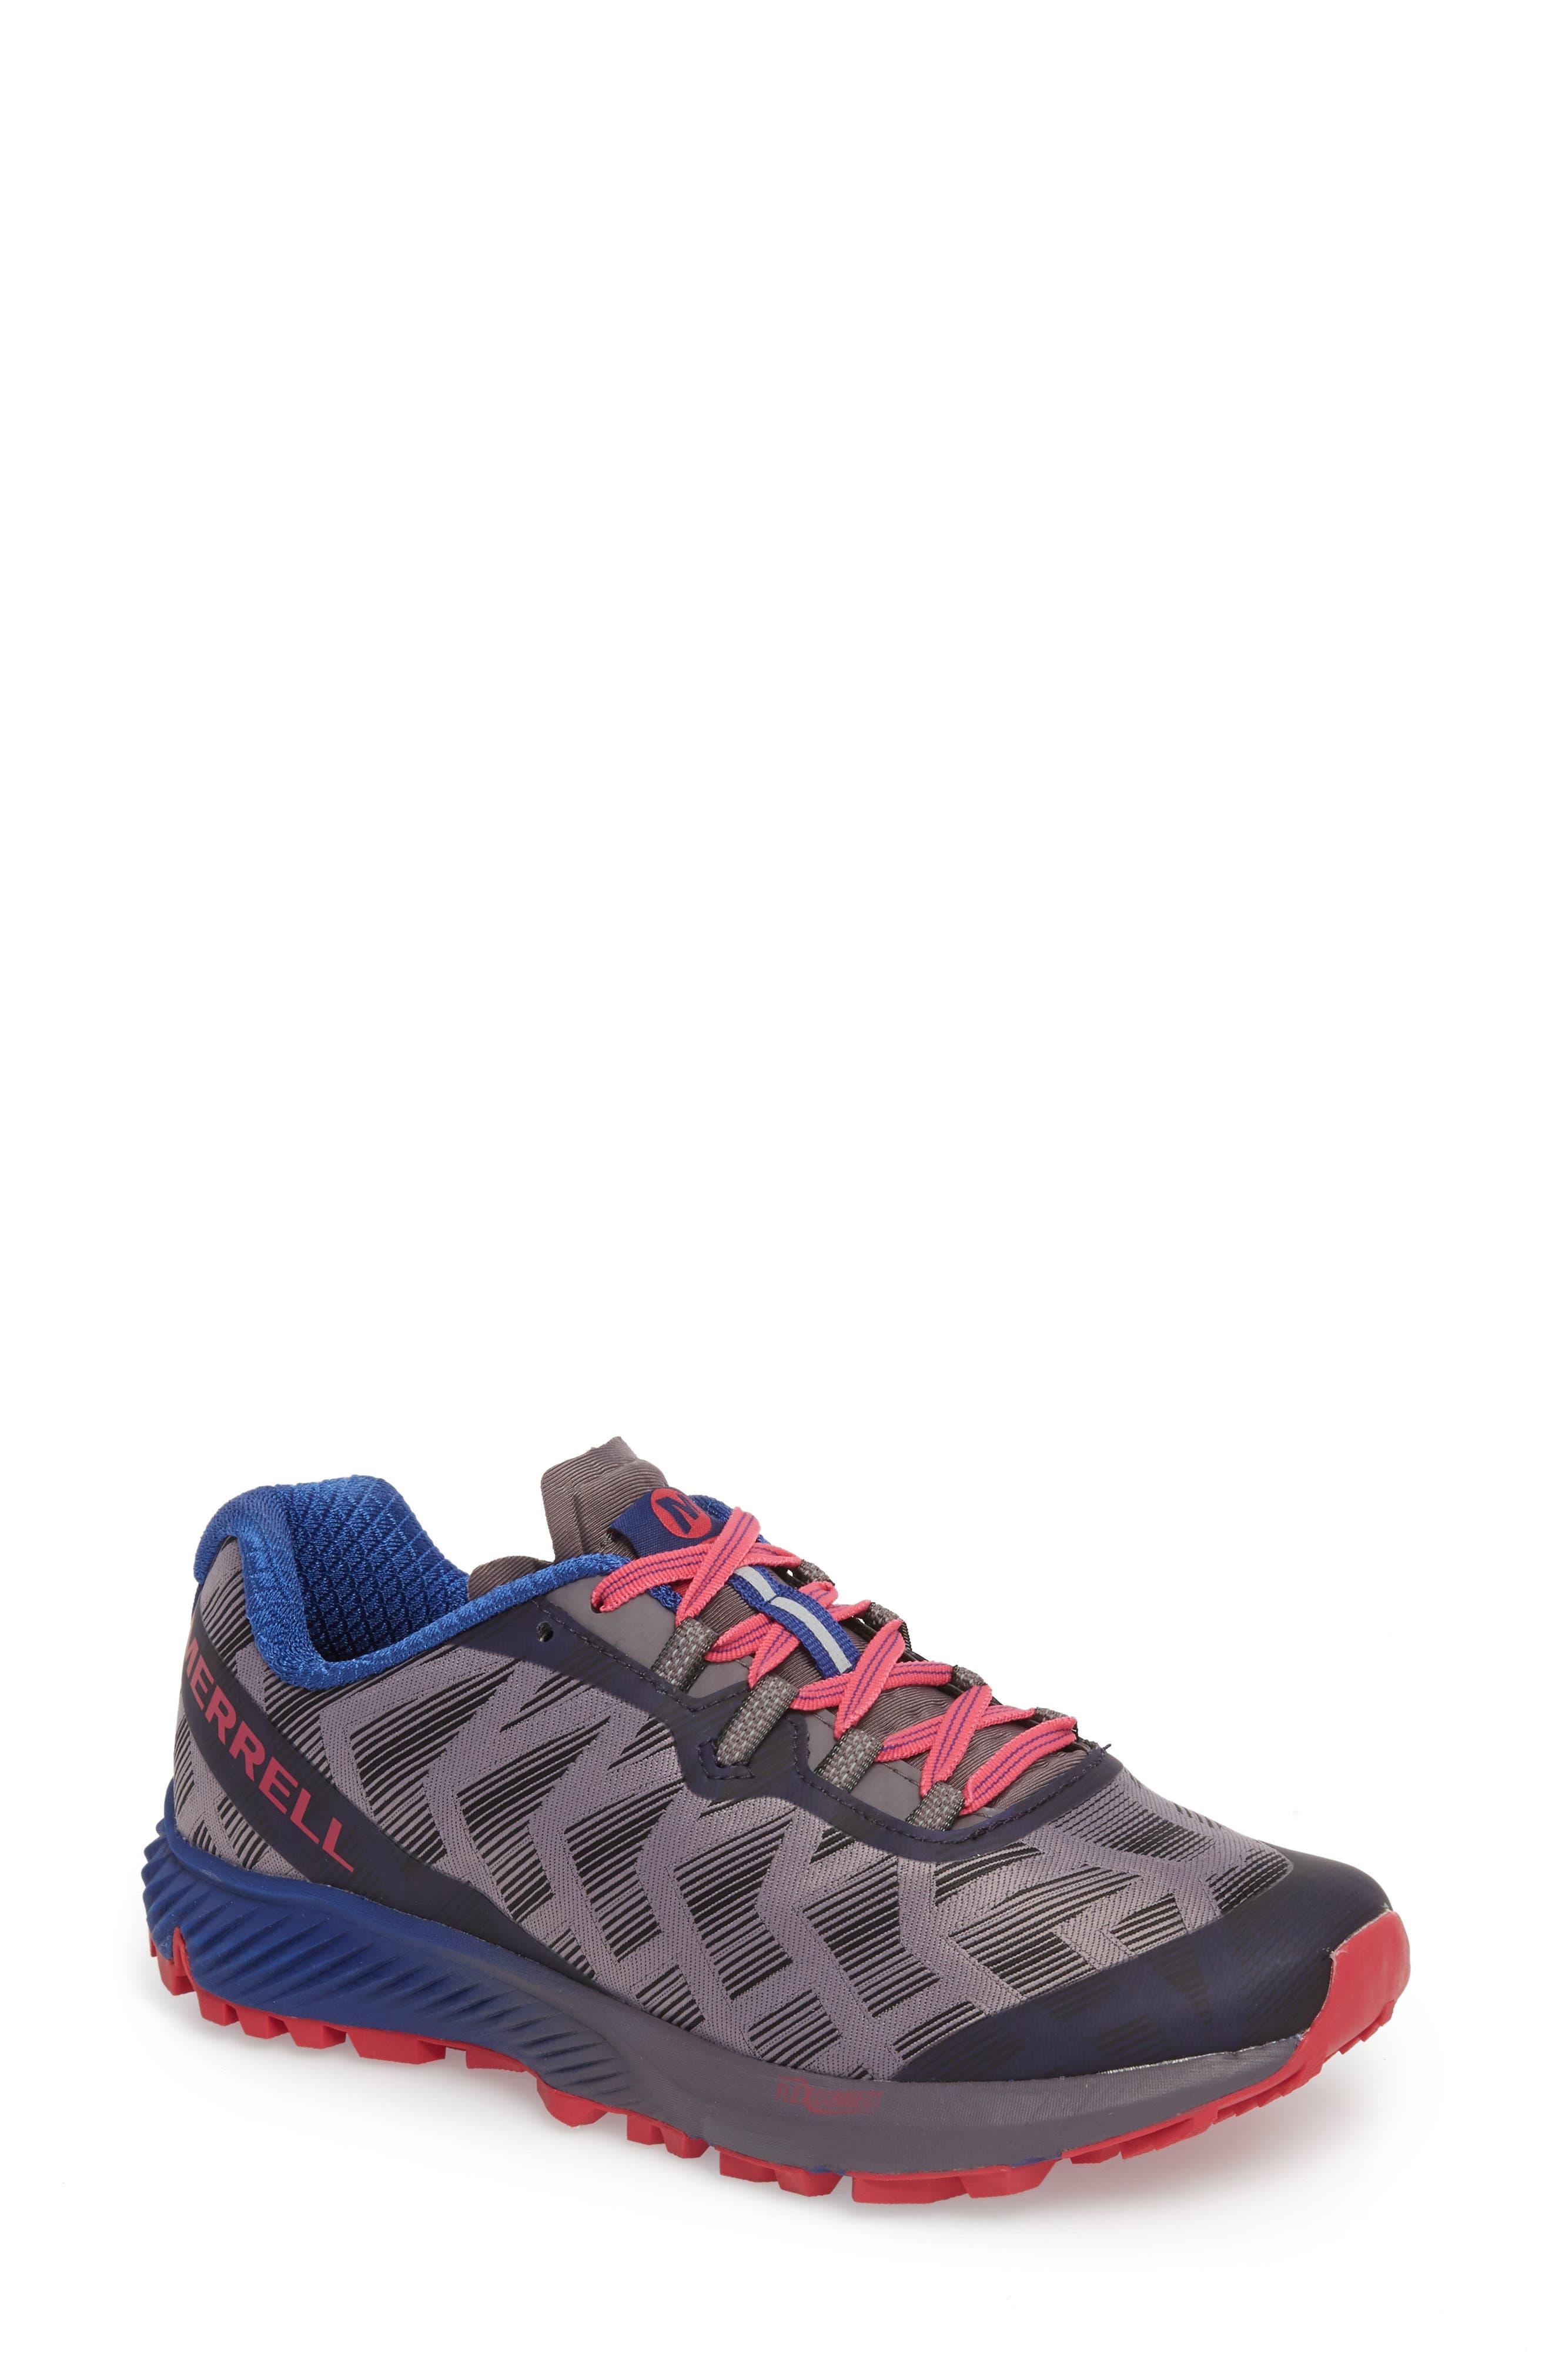 Agility Synthesis Flex Sneaker, Main, color, SHARK FABRIC